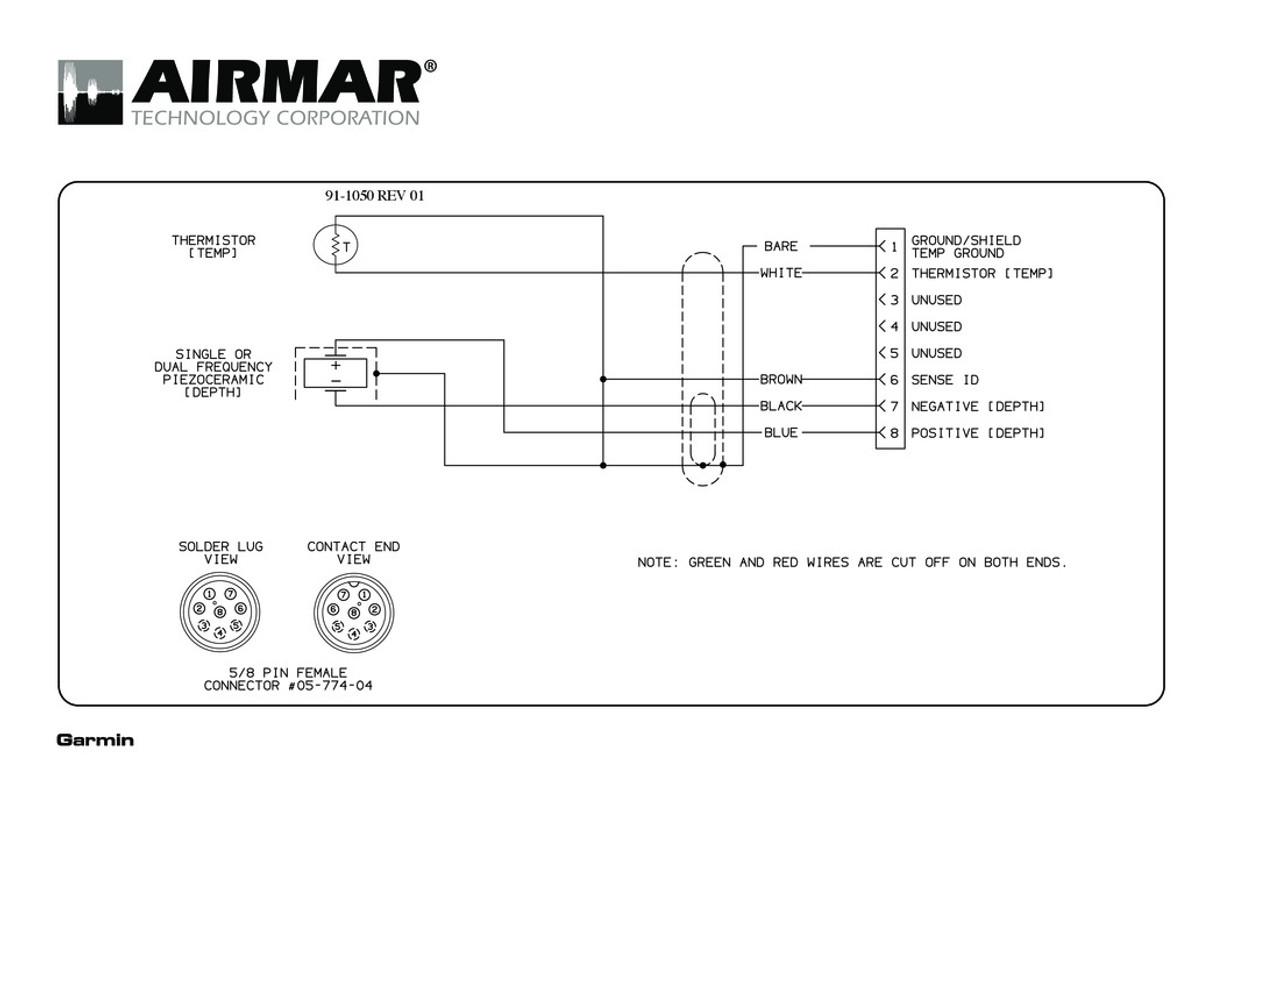 garmin 17 gps wiring diagram wiring diagrams schematics garmin 3010c manual operator 18 5 wiring diagram [ 1100 x 850 Pixel ]